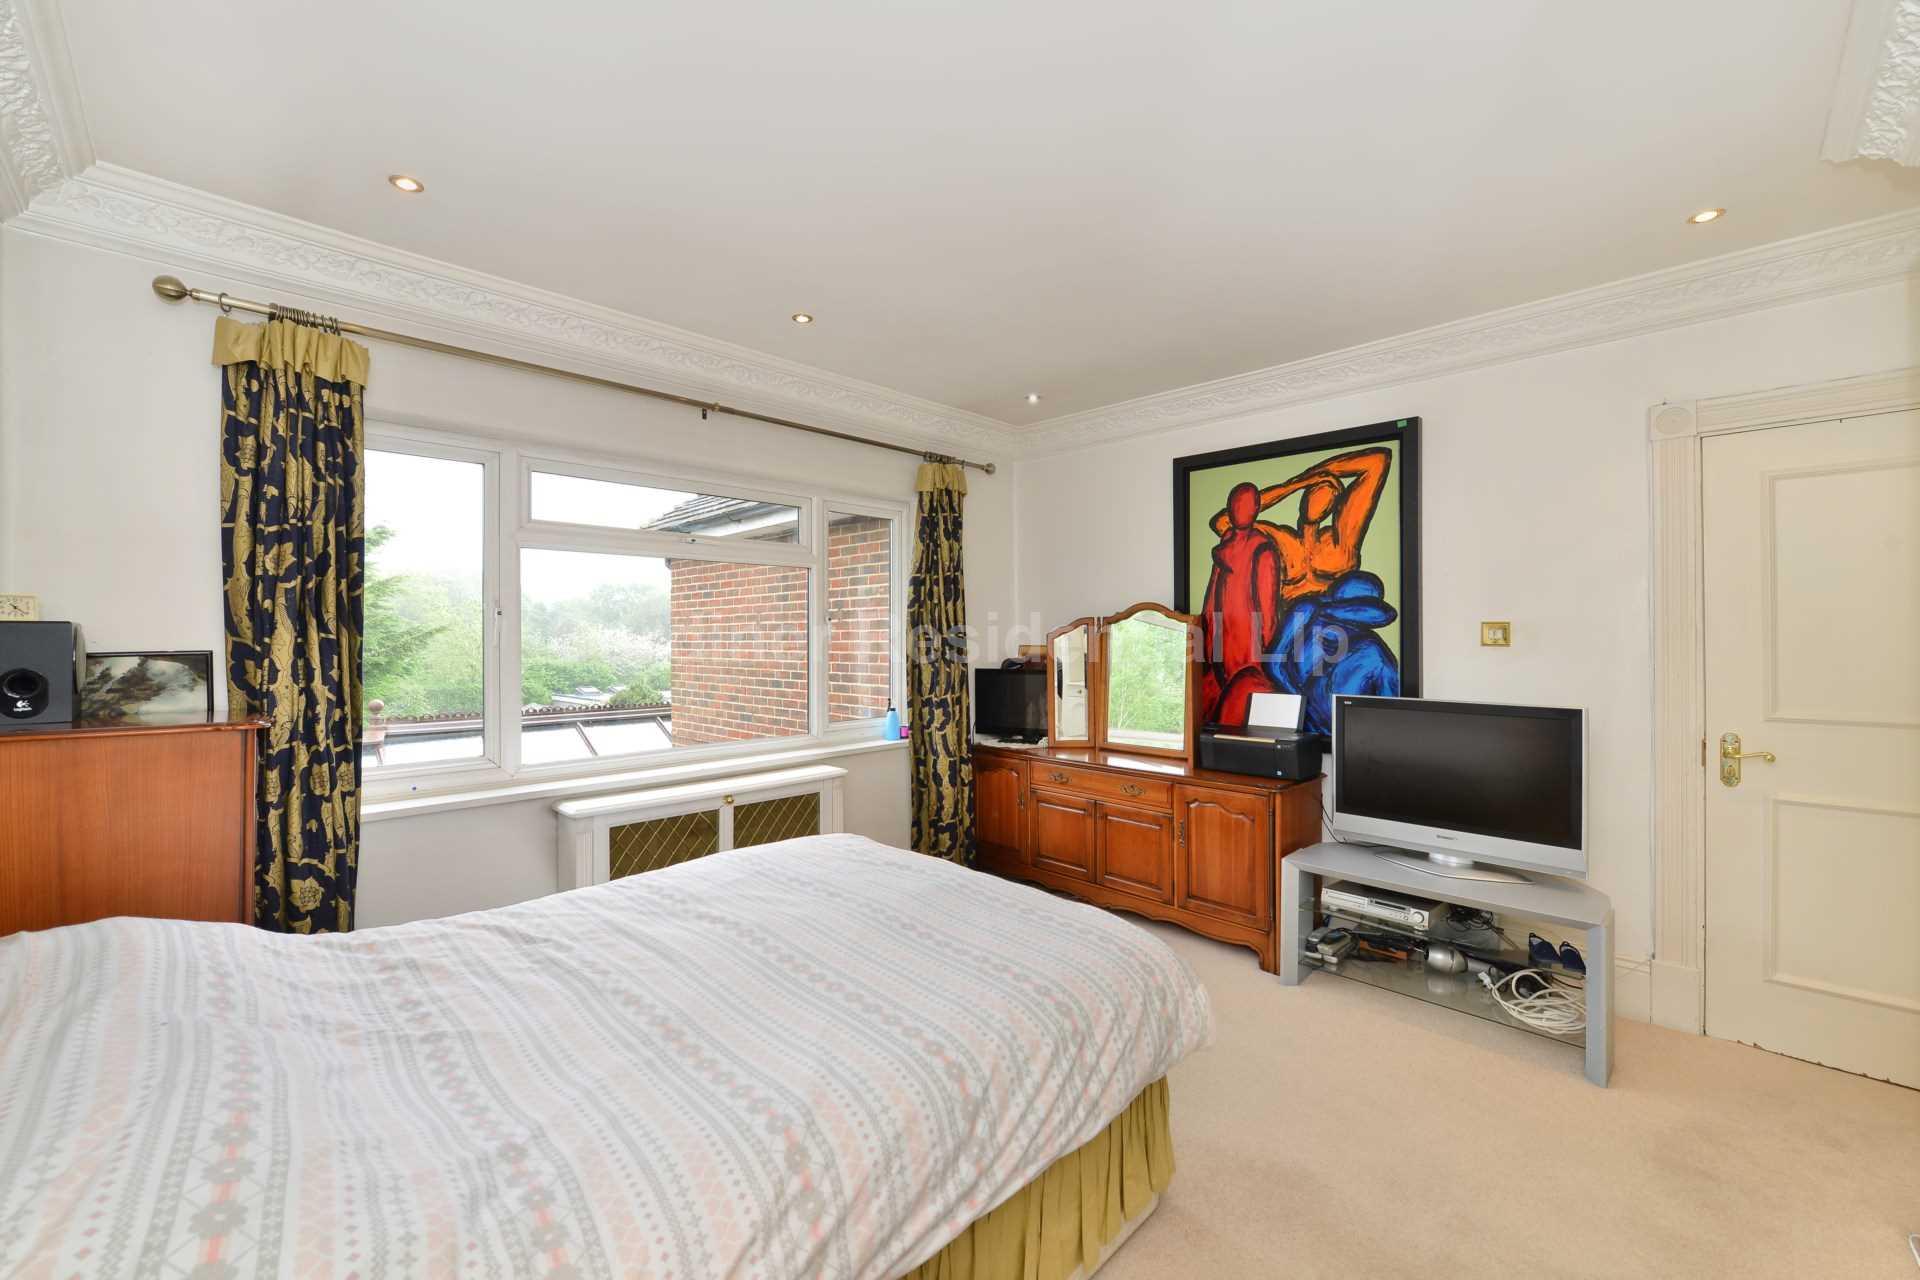 http://www.brightlogic-estateagents.co.uk/GARD/upload//4-20.jpg